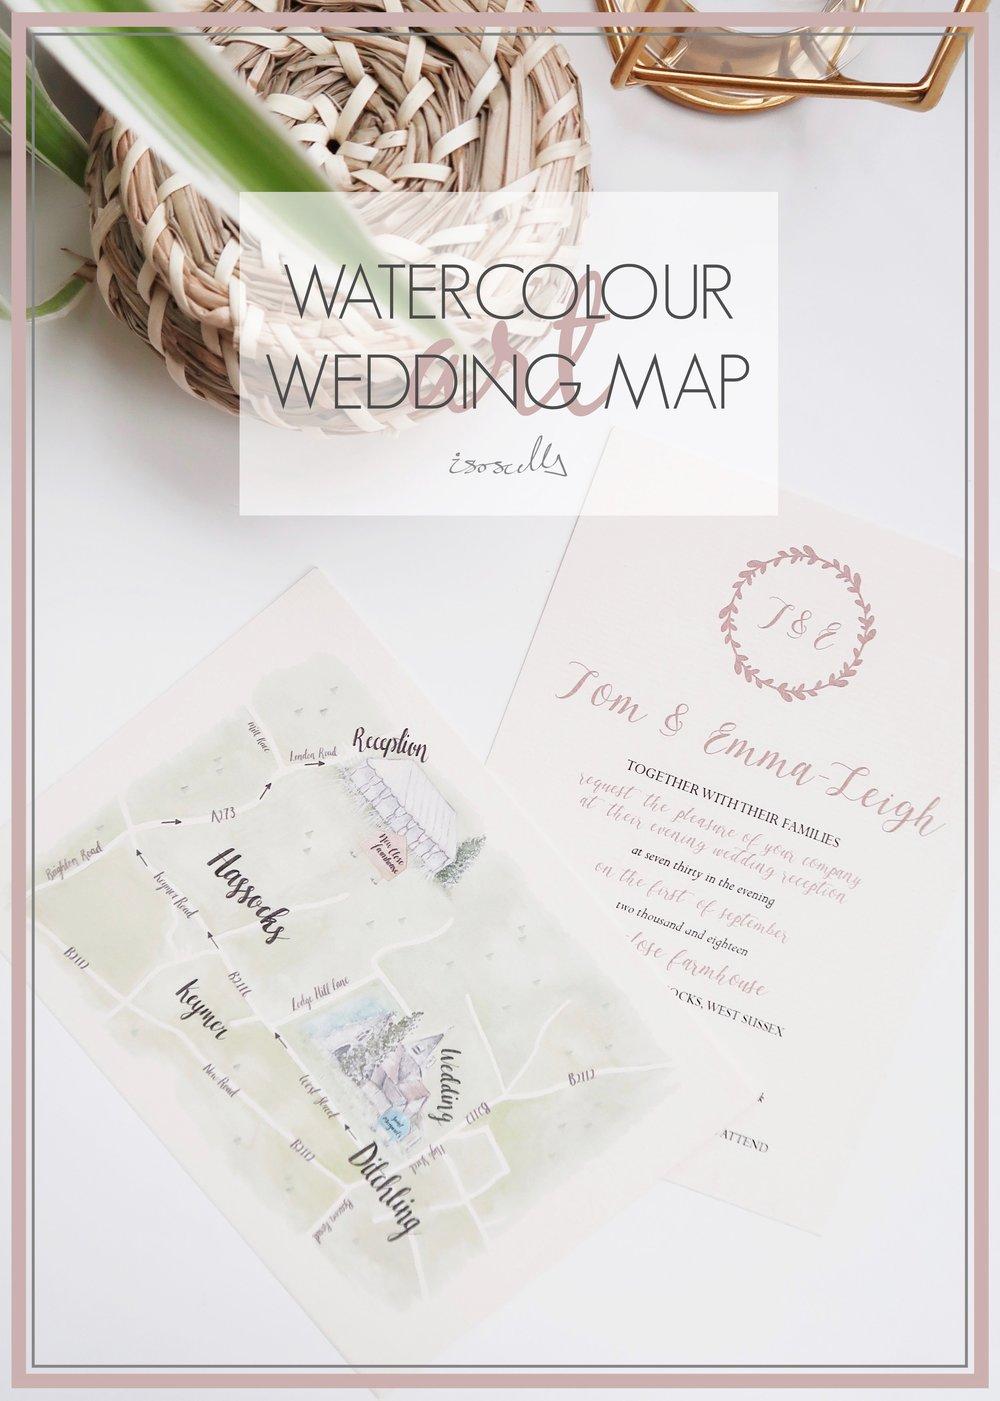 Watercolour Wedding Map by Isoscella